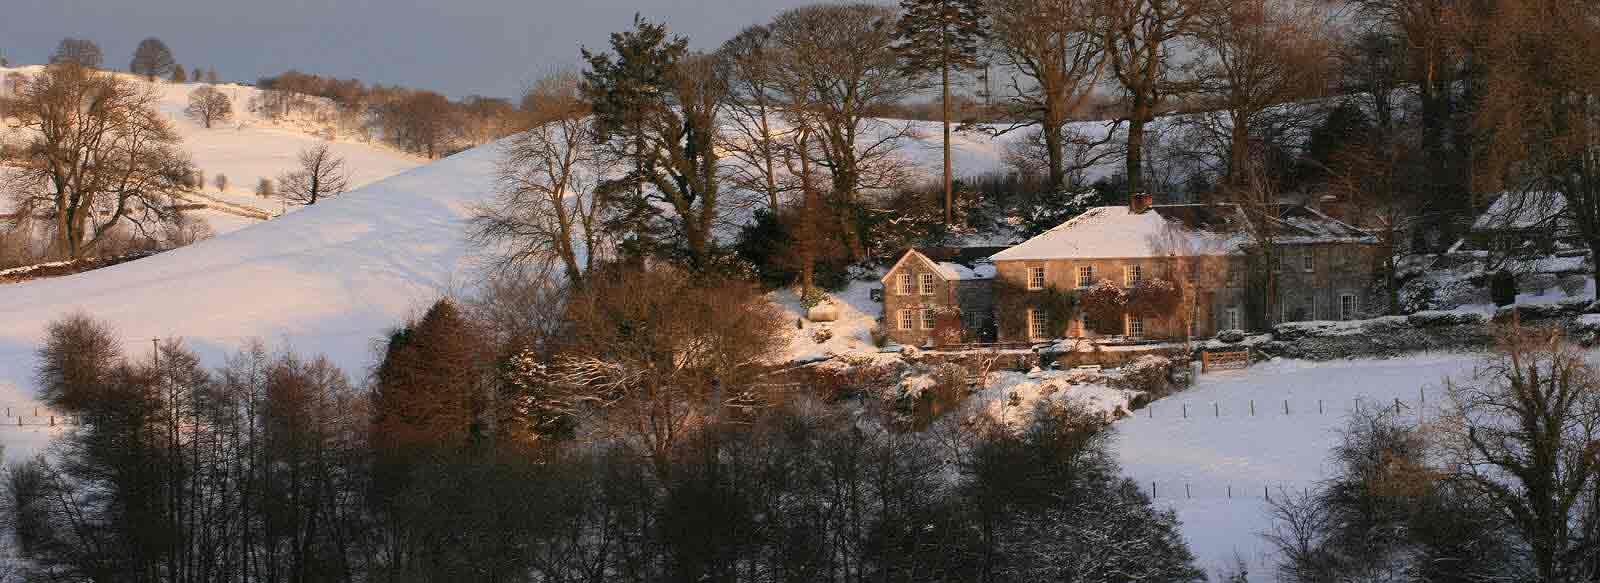 snow at Pen-y-Dyffryn